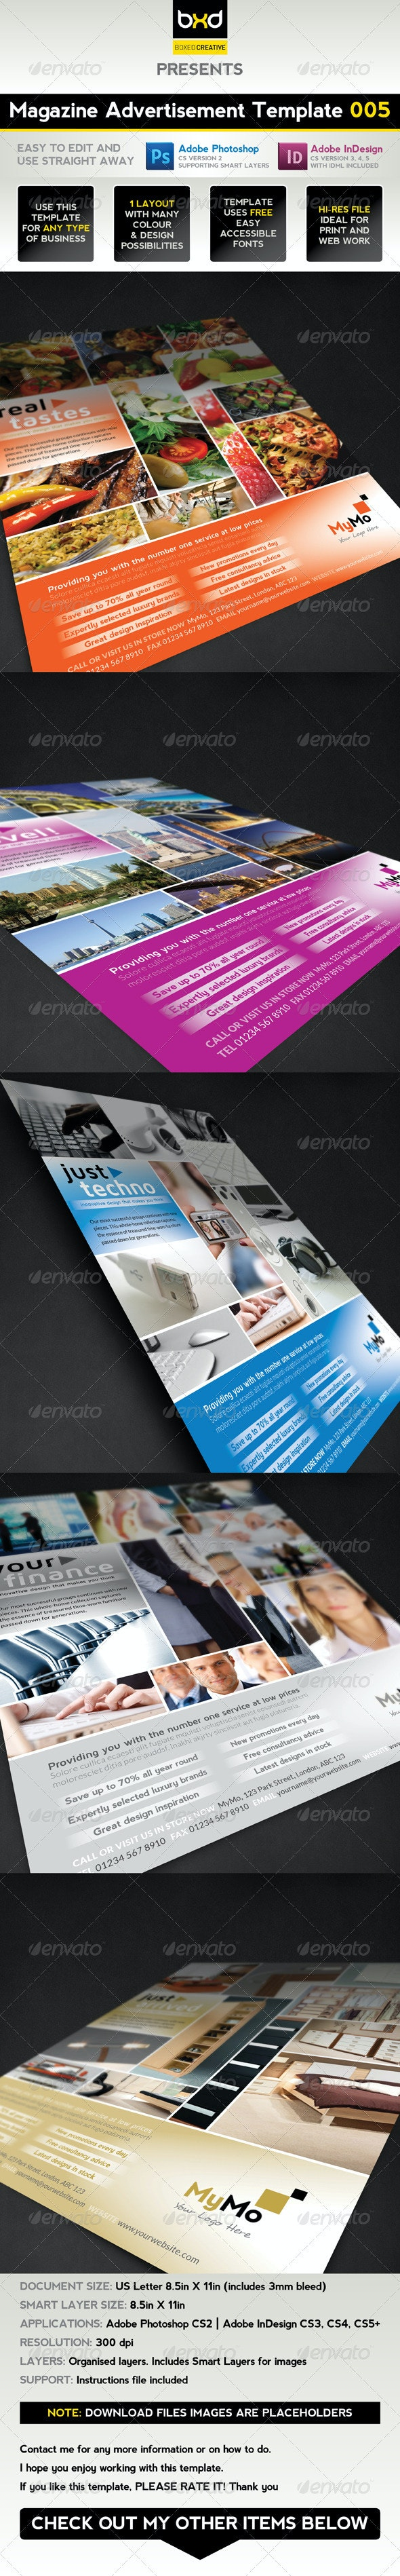 Magazine Advert Template 005 - Magazines Print Templates